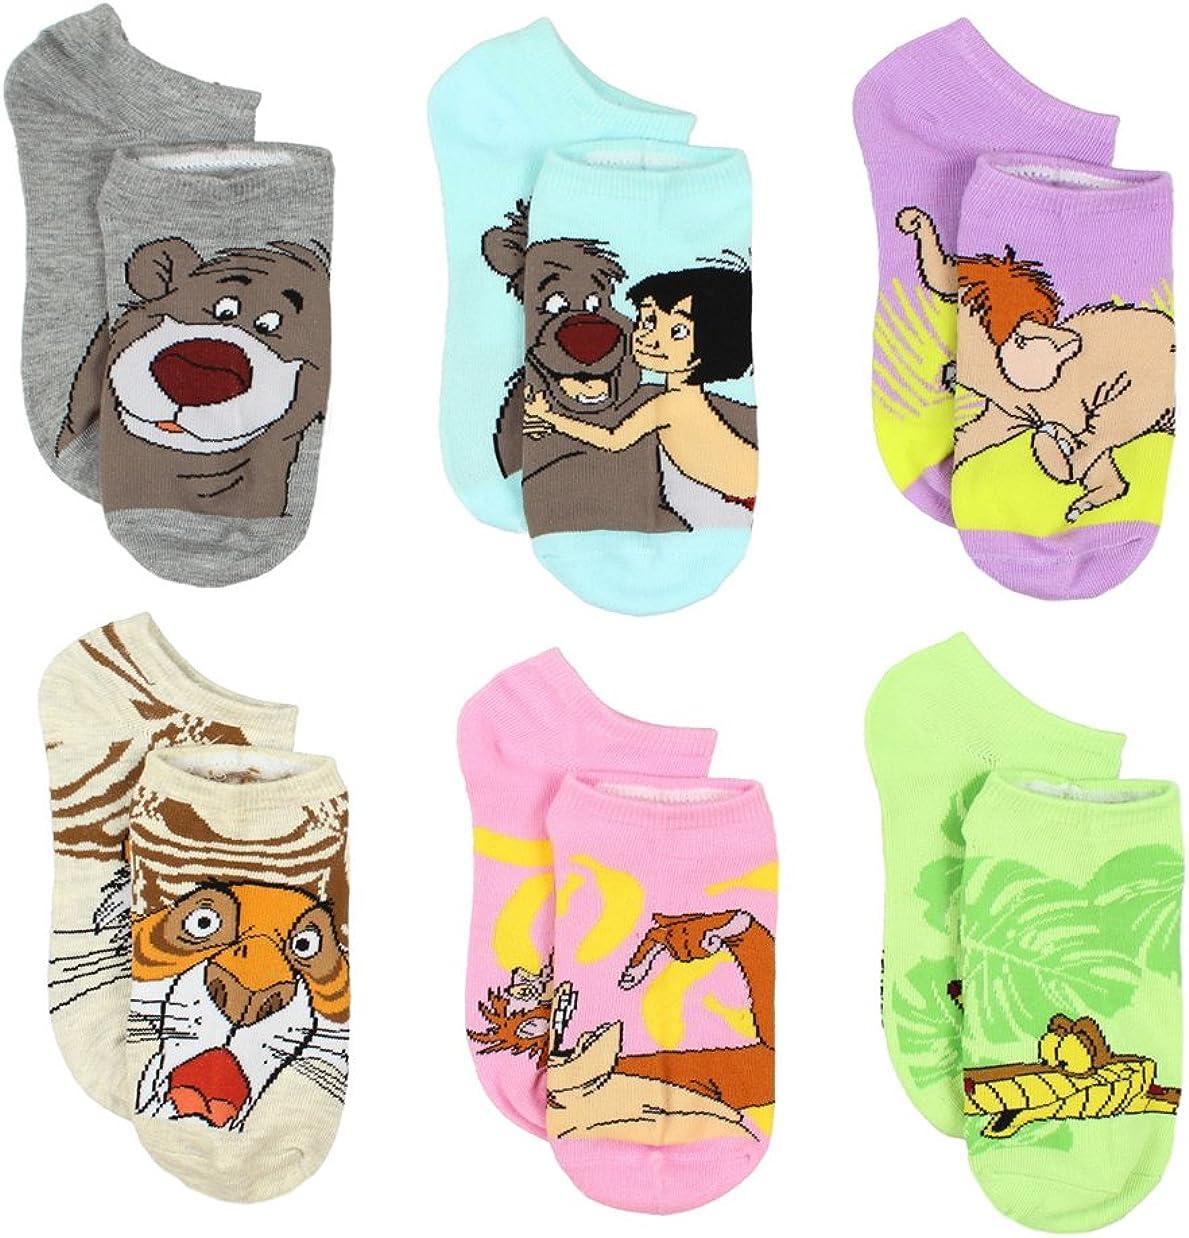 The Jungle Book 6 pack Socks (Little Kid/Big Kid/Teen/Adult)